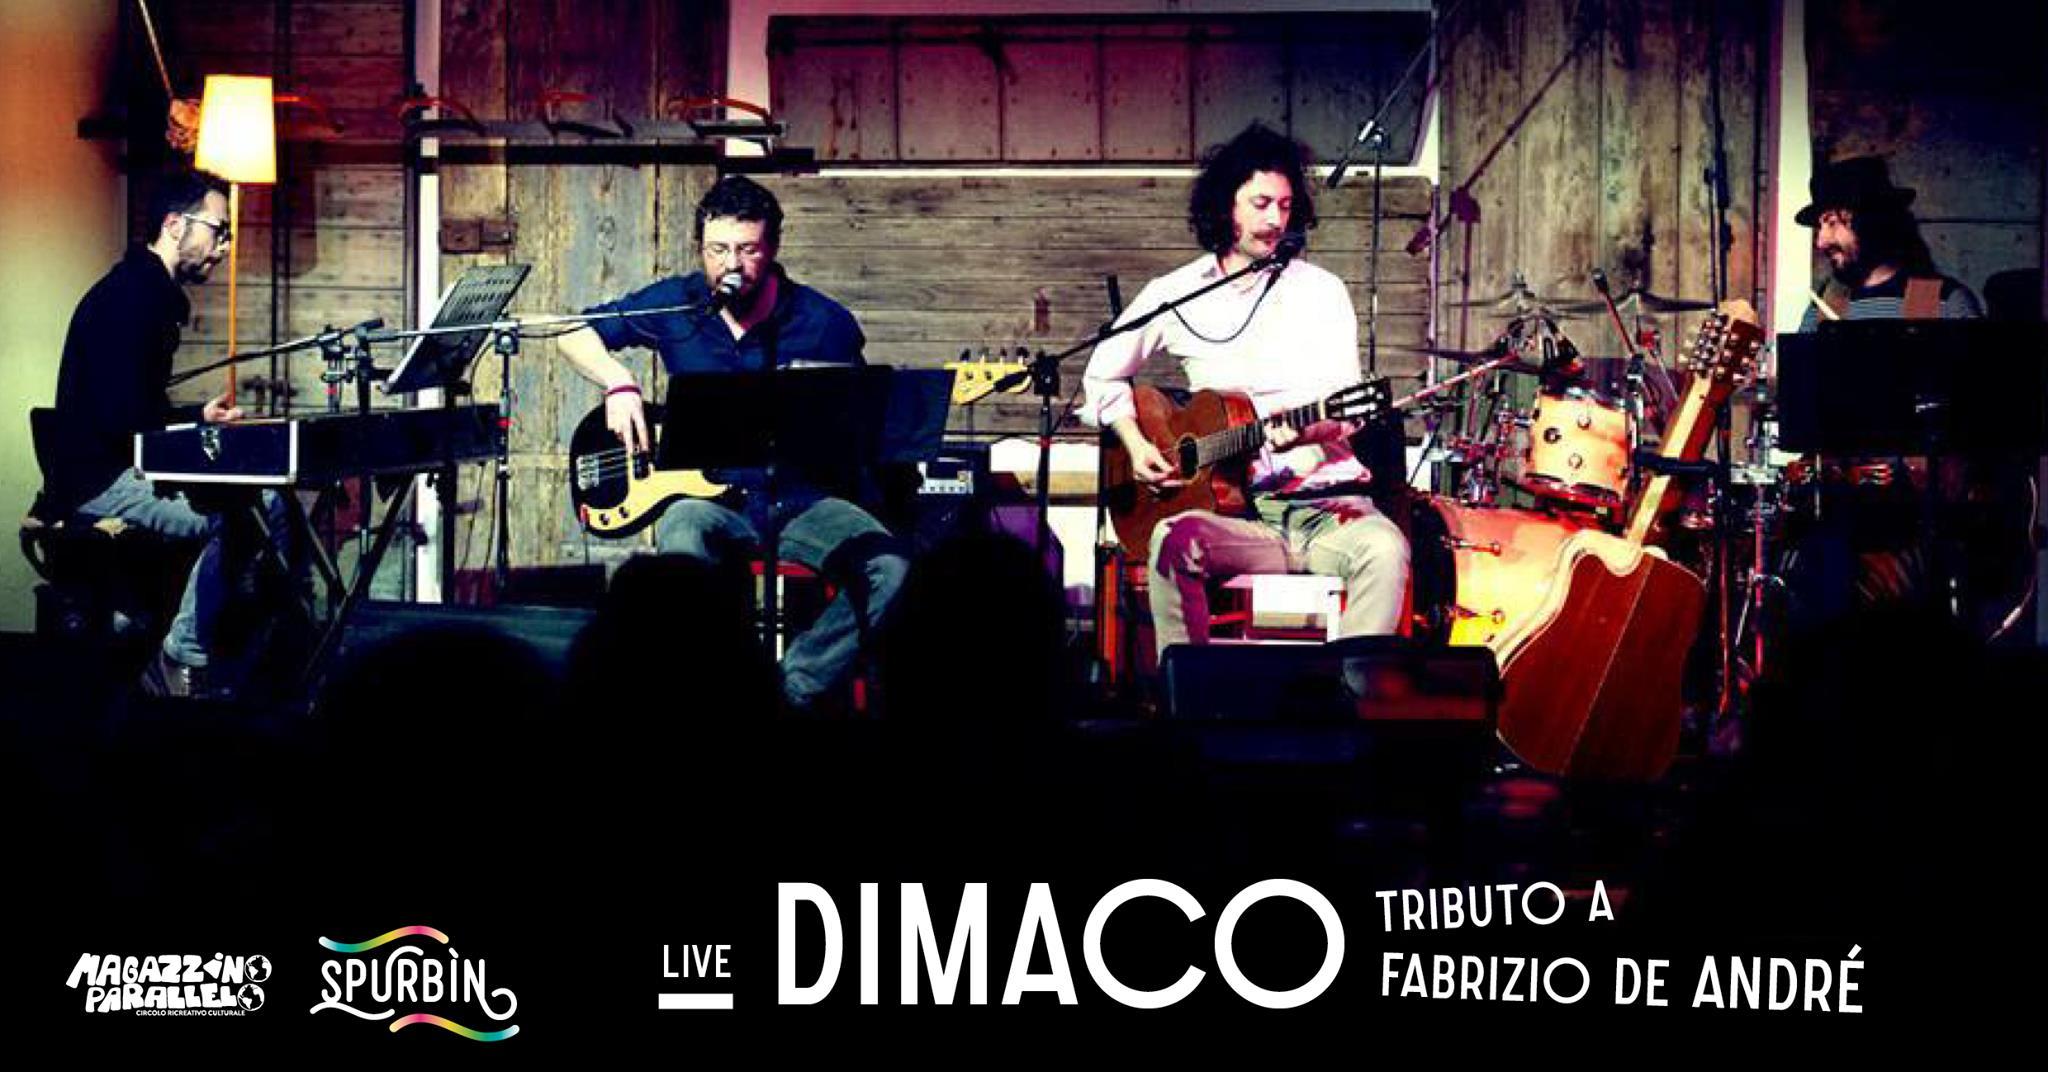 Dimaco - Tributo a Fabrizio De André / at Spurbìn